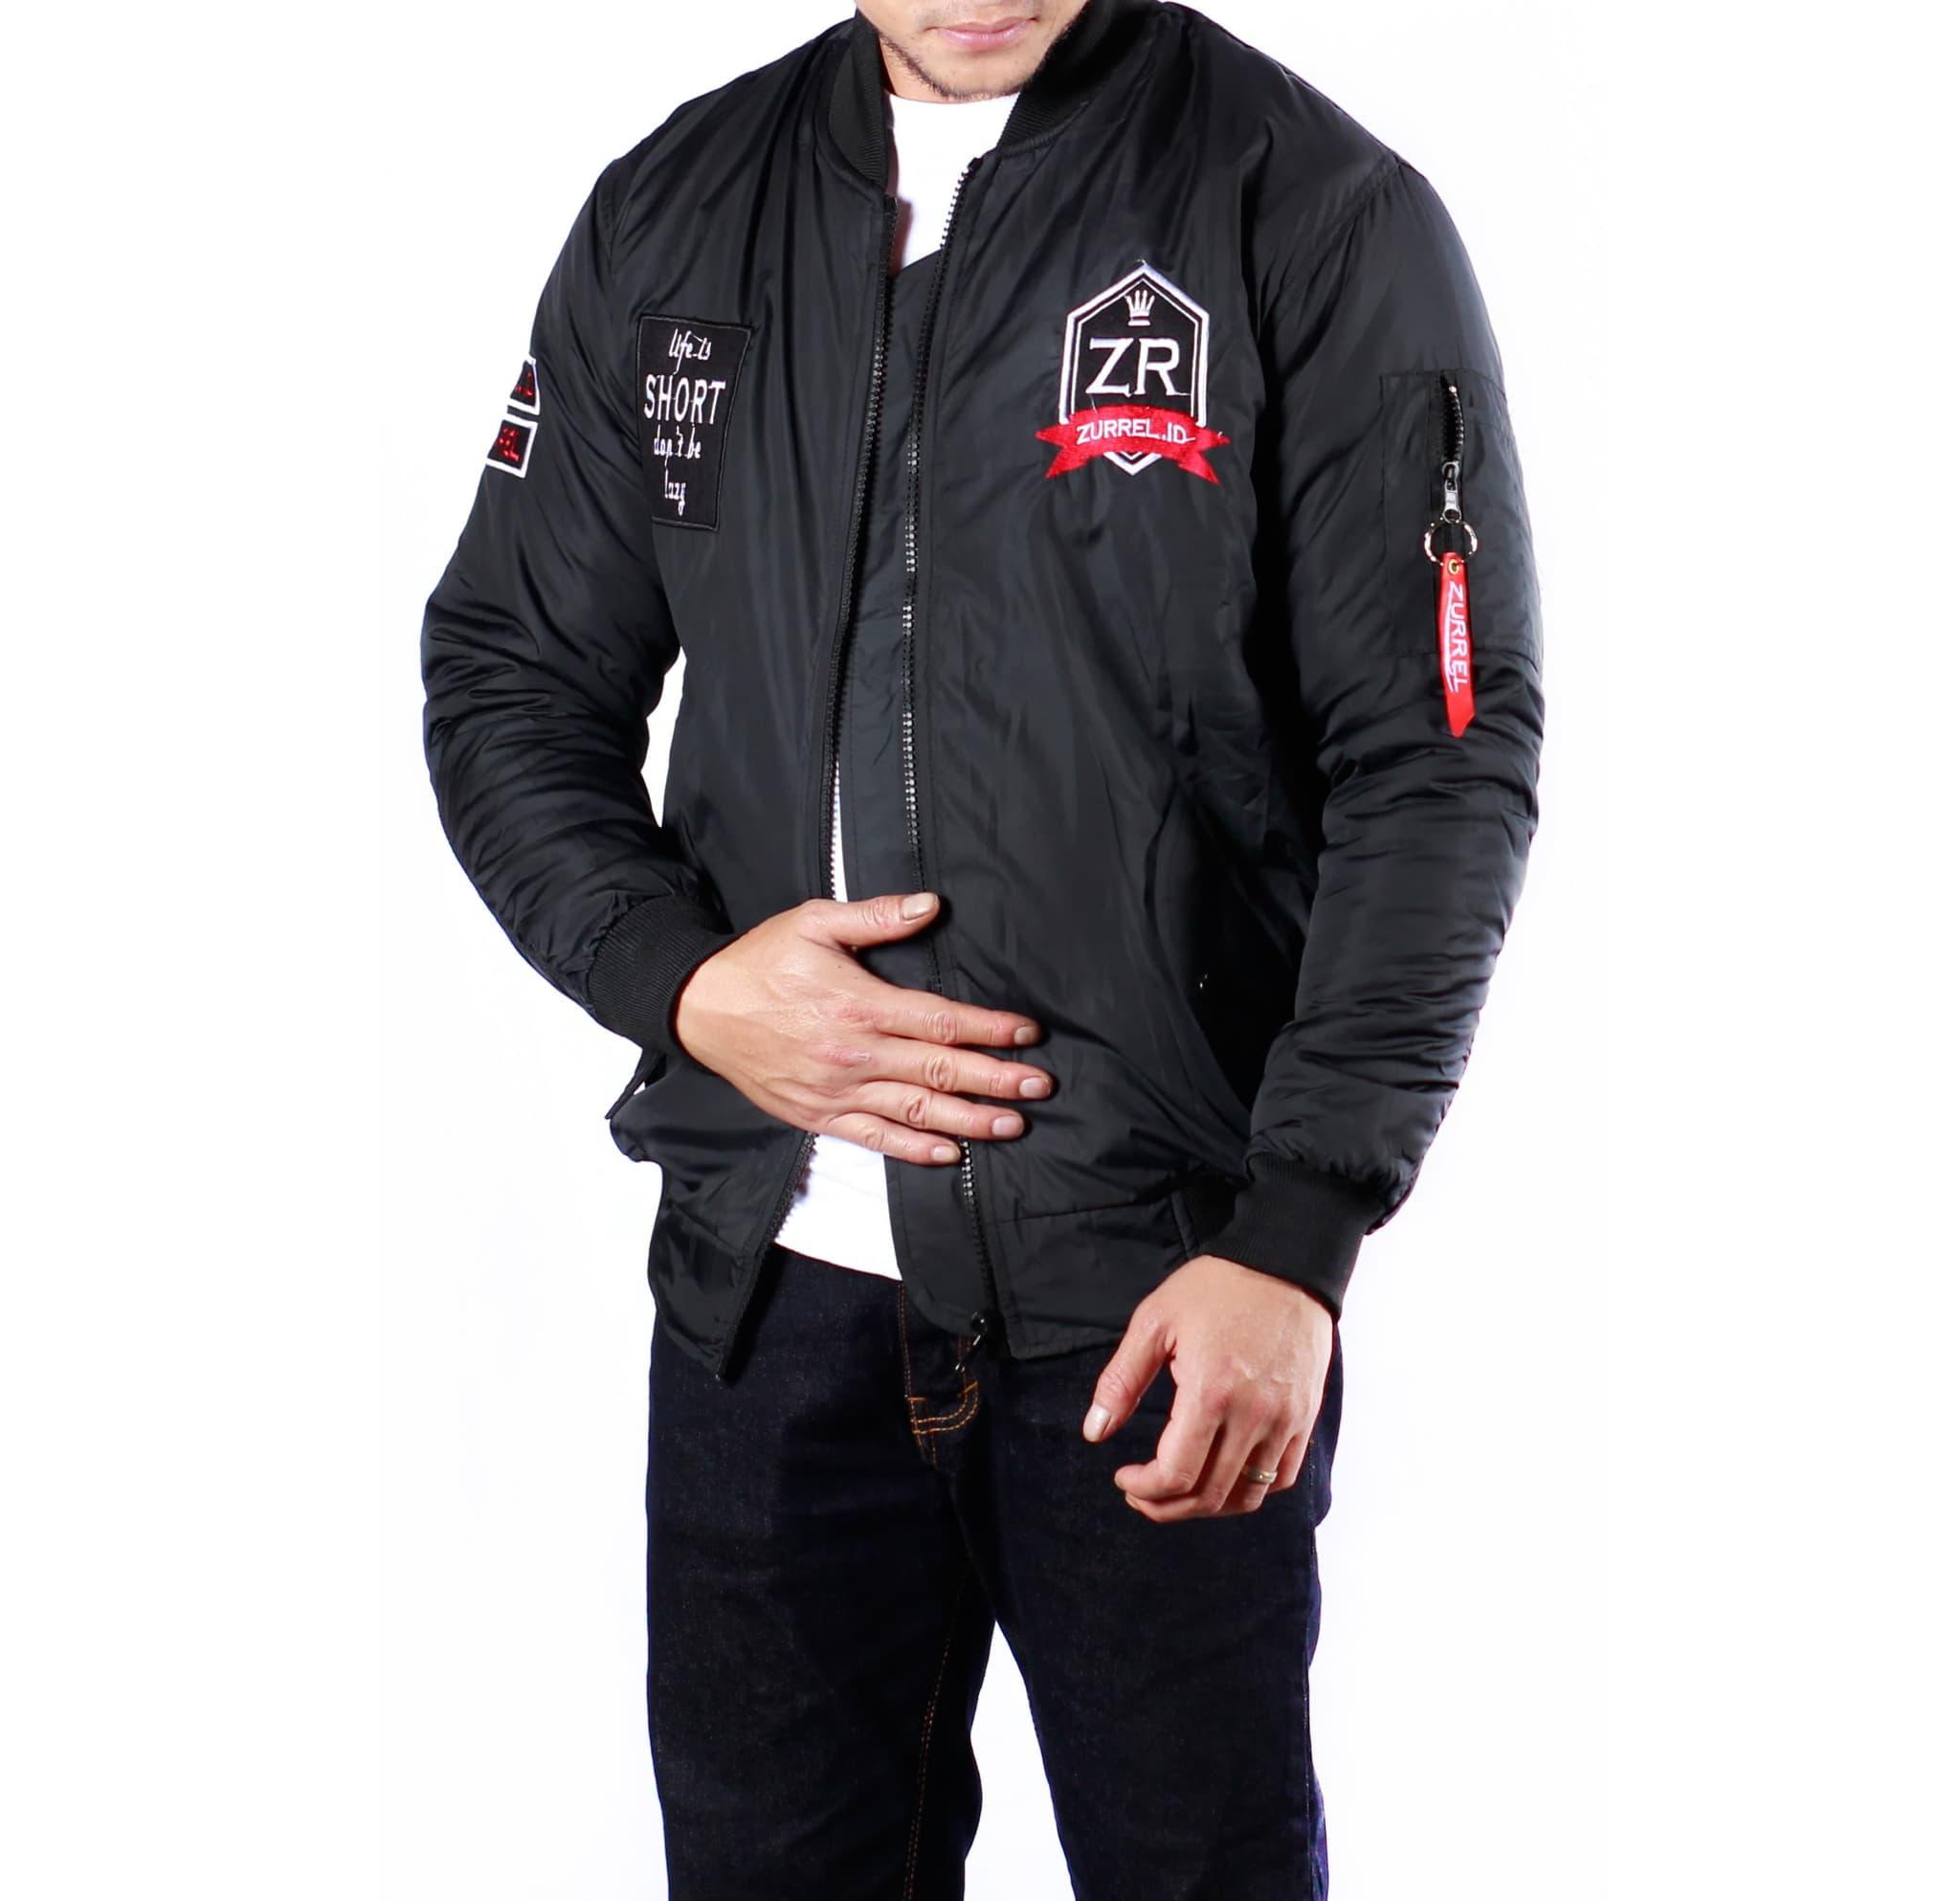 Jual Jaket Bomber Zurrel King Black Baseball Karlit Fleece Button